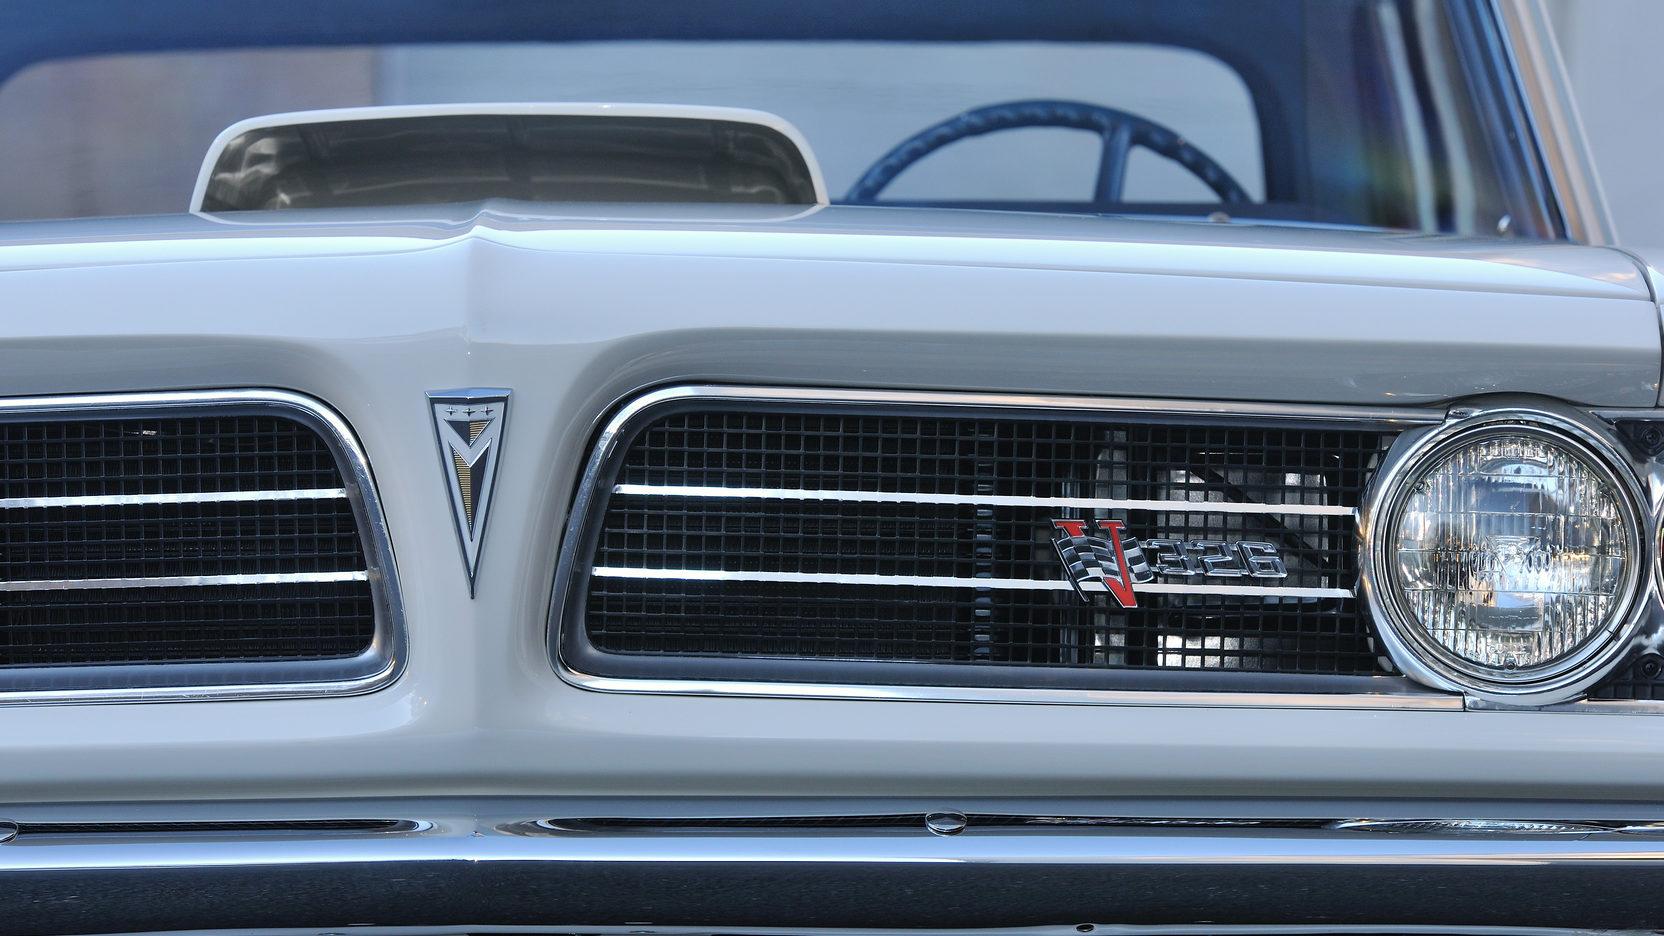 1963 Pontiac Tempest Super Duty front grill